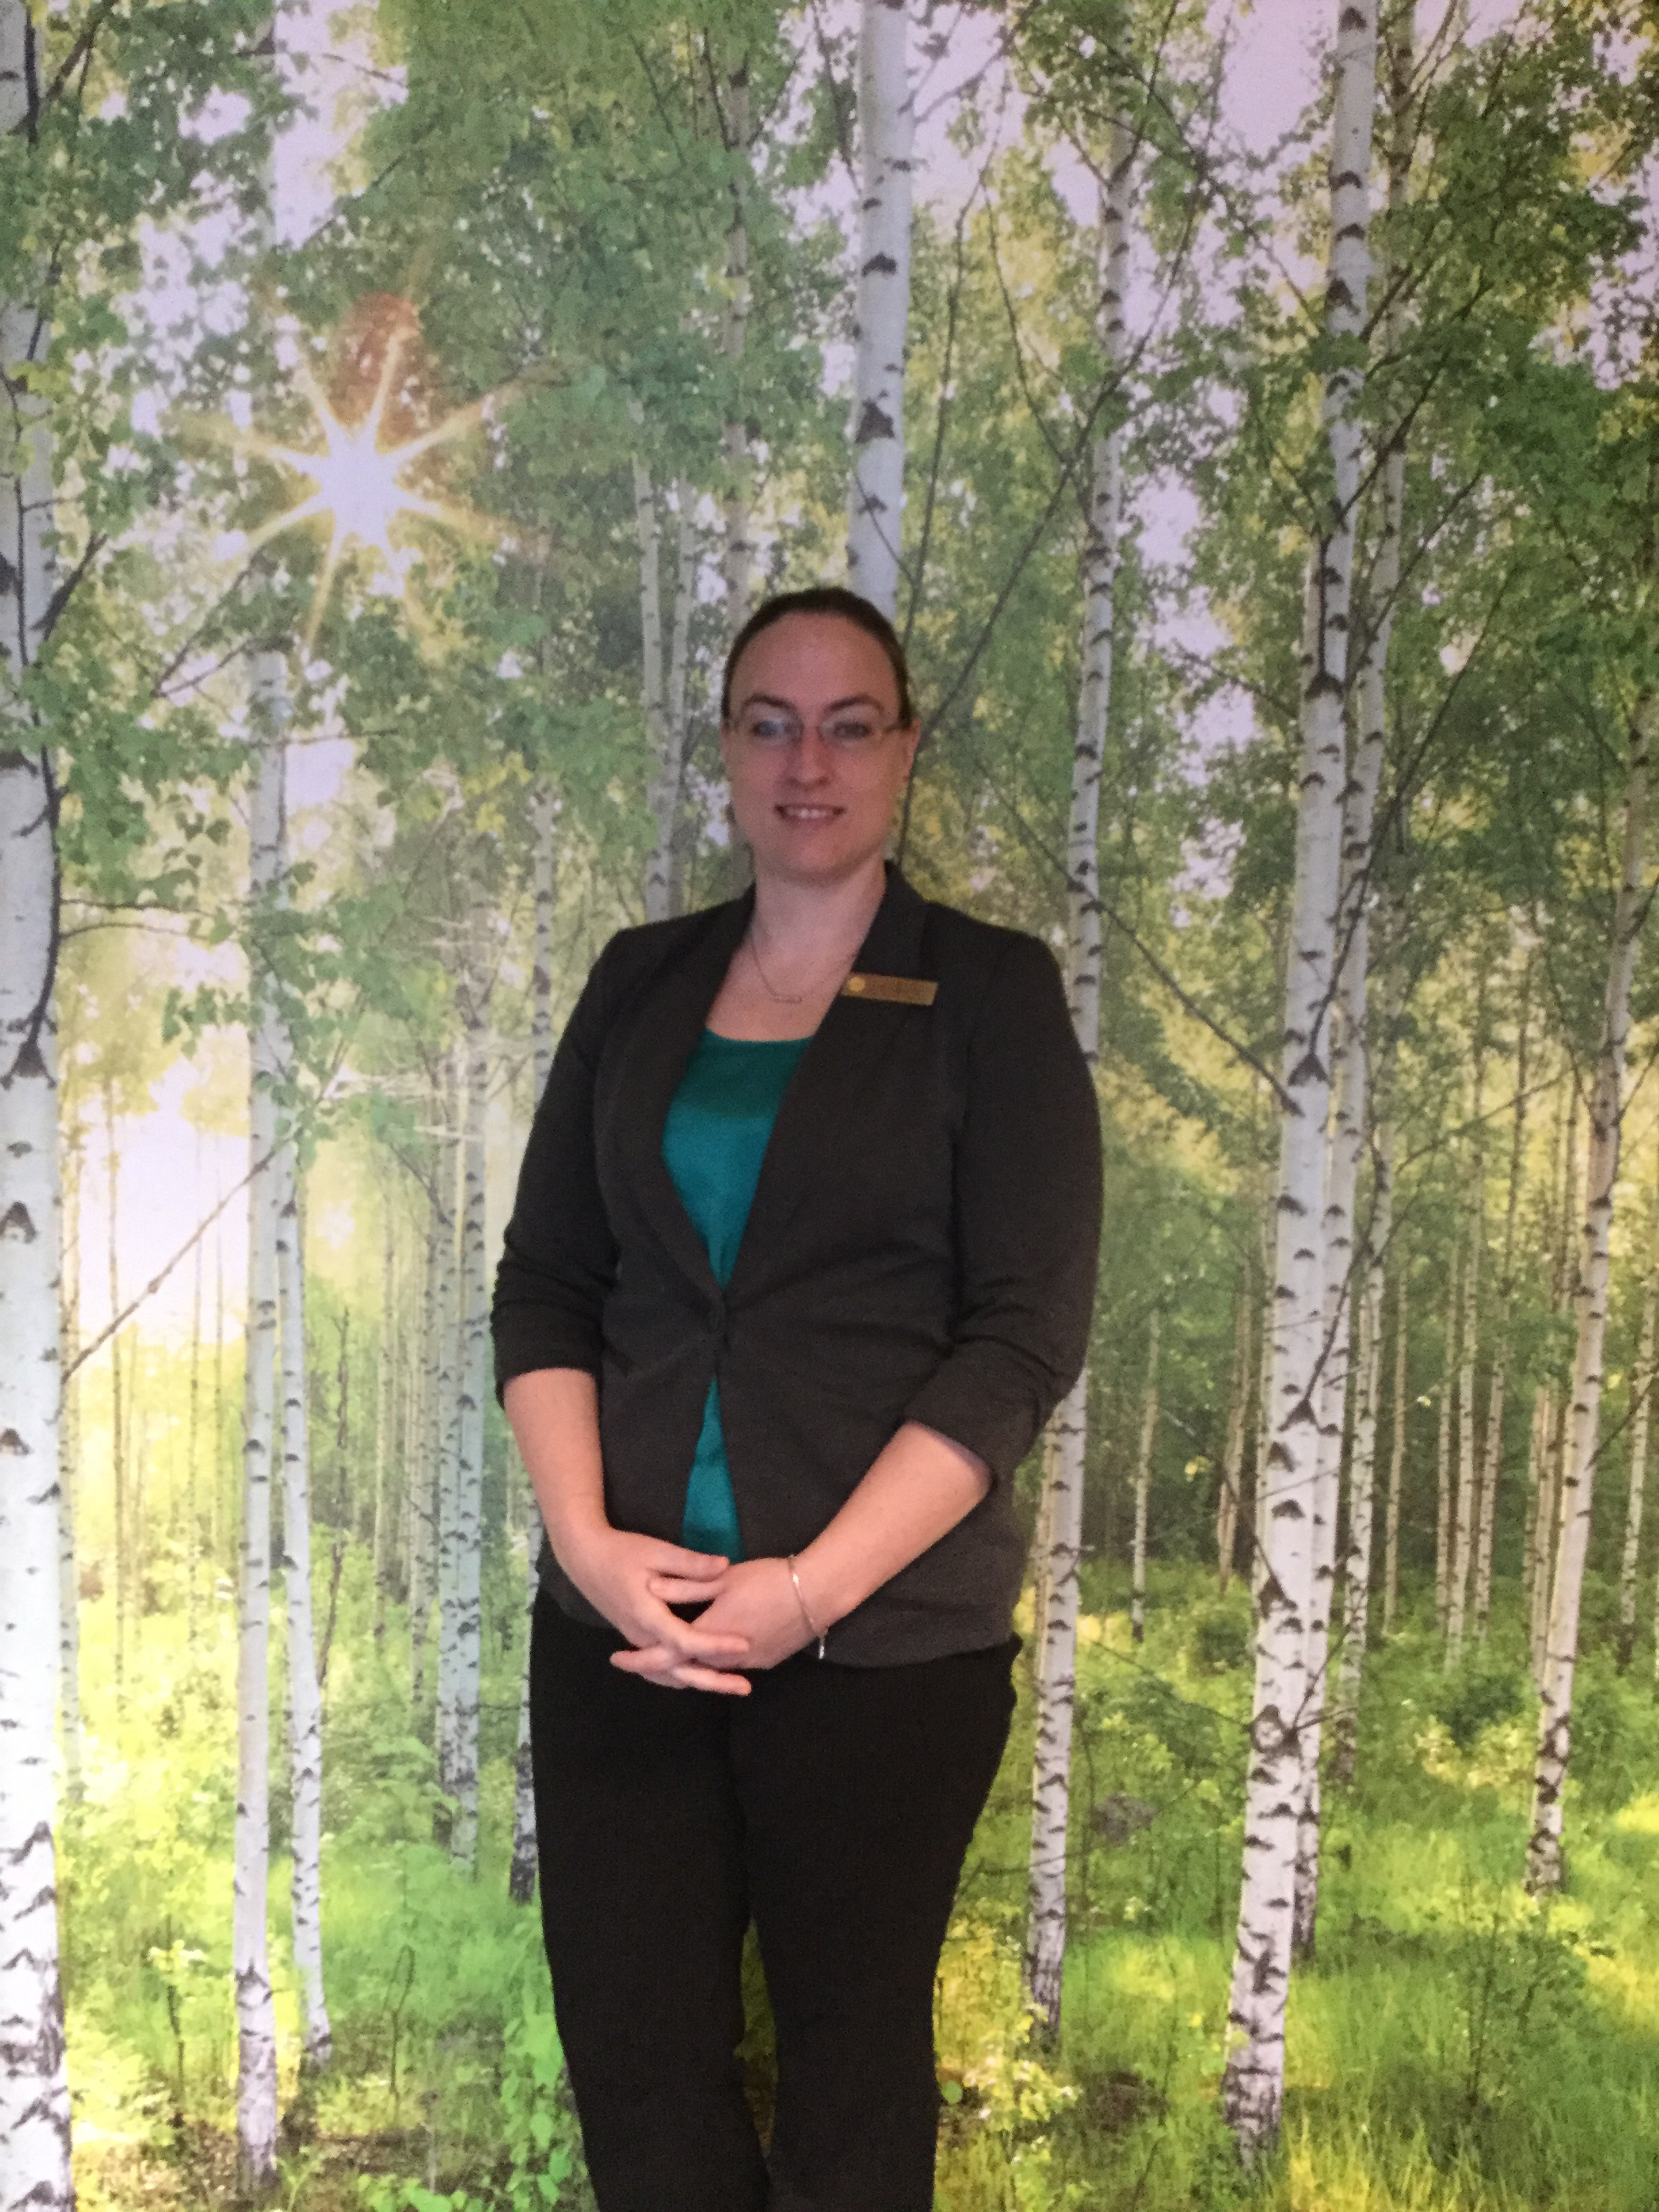 Sarah Pearson - Food Service Director